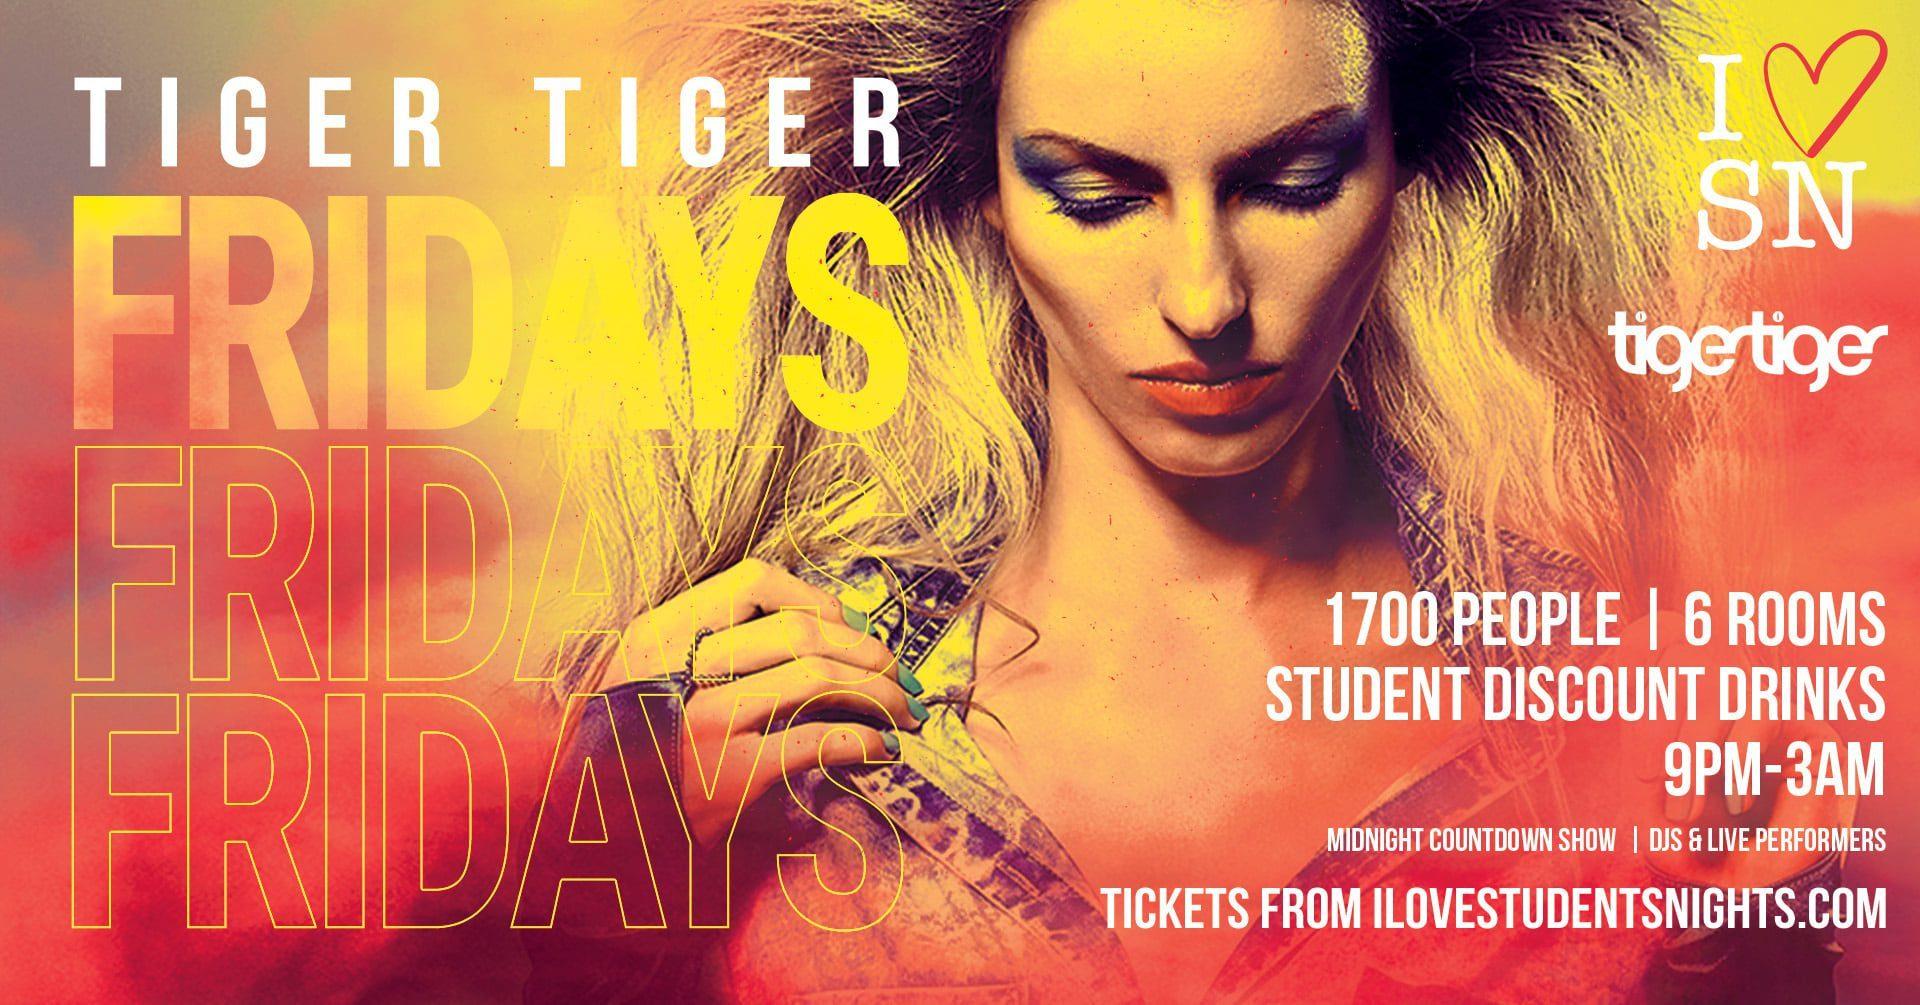 Tiger Tiger London every Friday